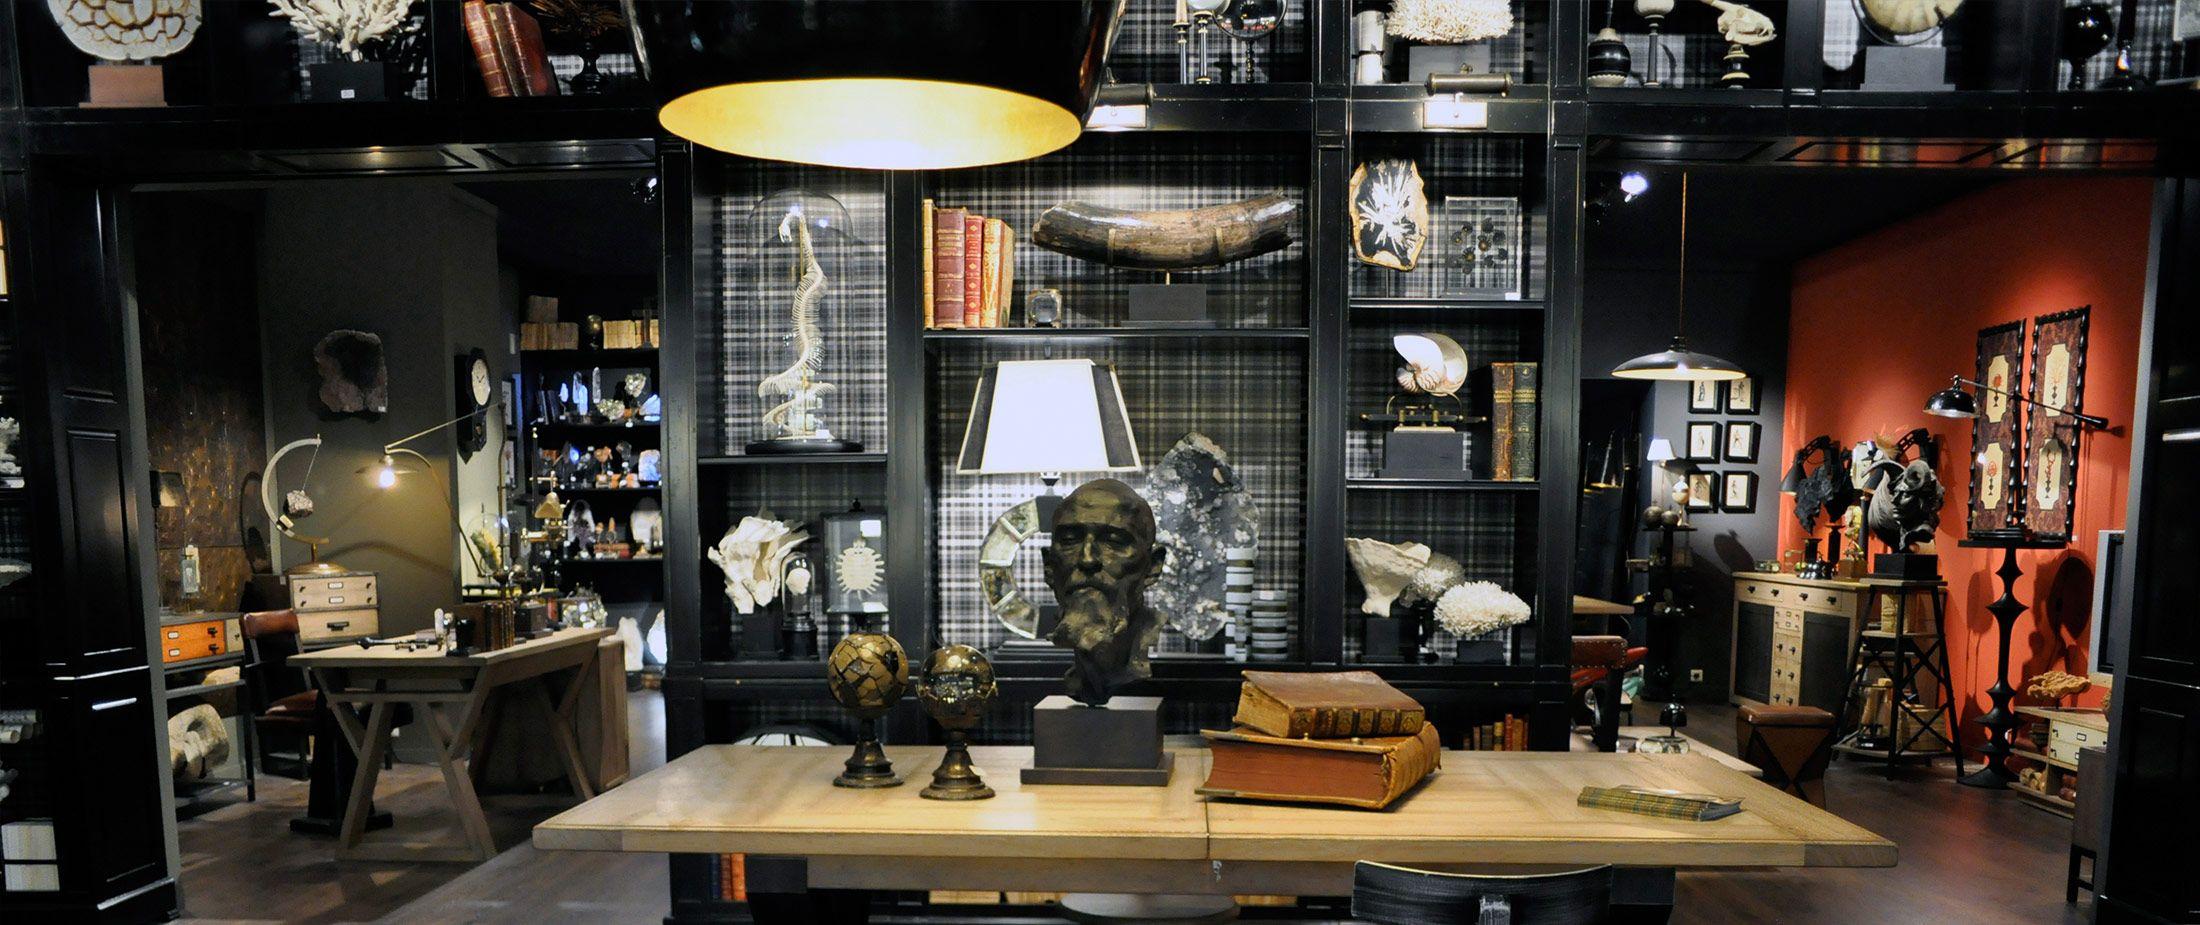 objet de curiosit cabinets des curiosit s et objets insolites pinterest objet de. Black Bedroom Furniture Sets. Home Design Ideas